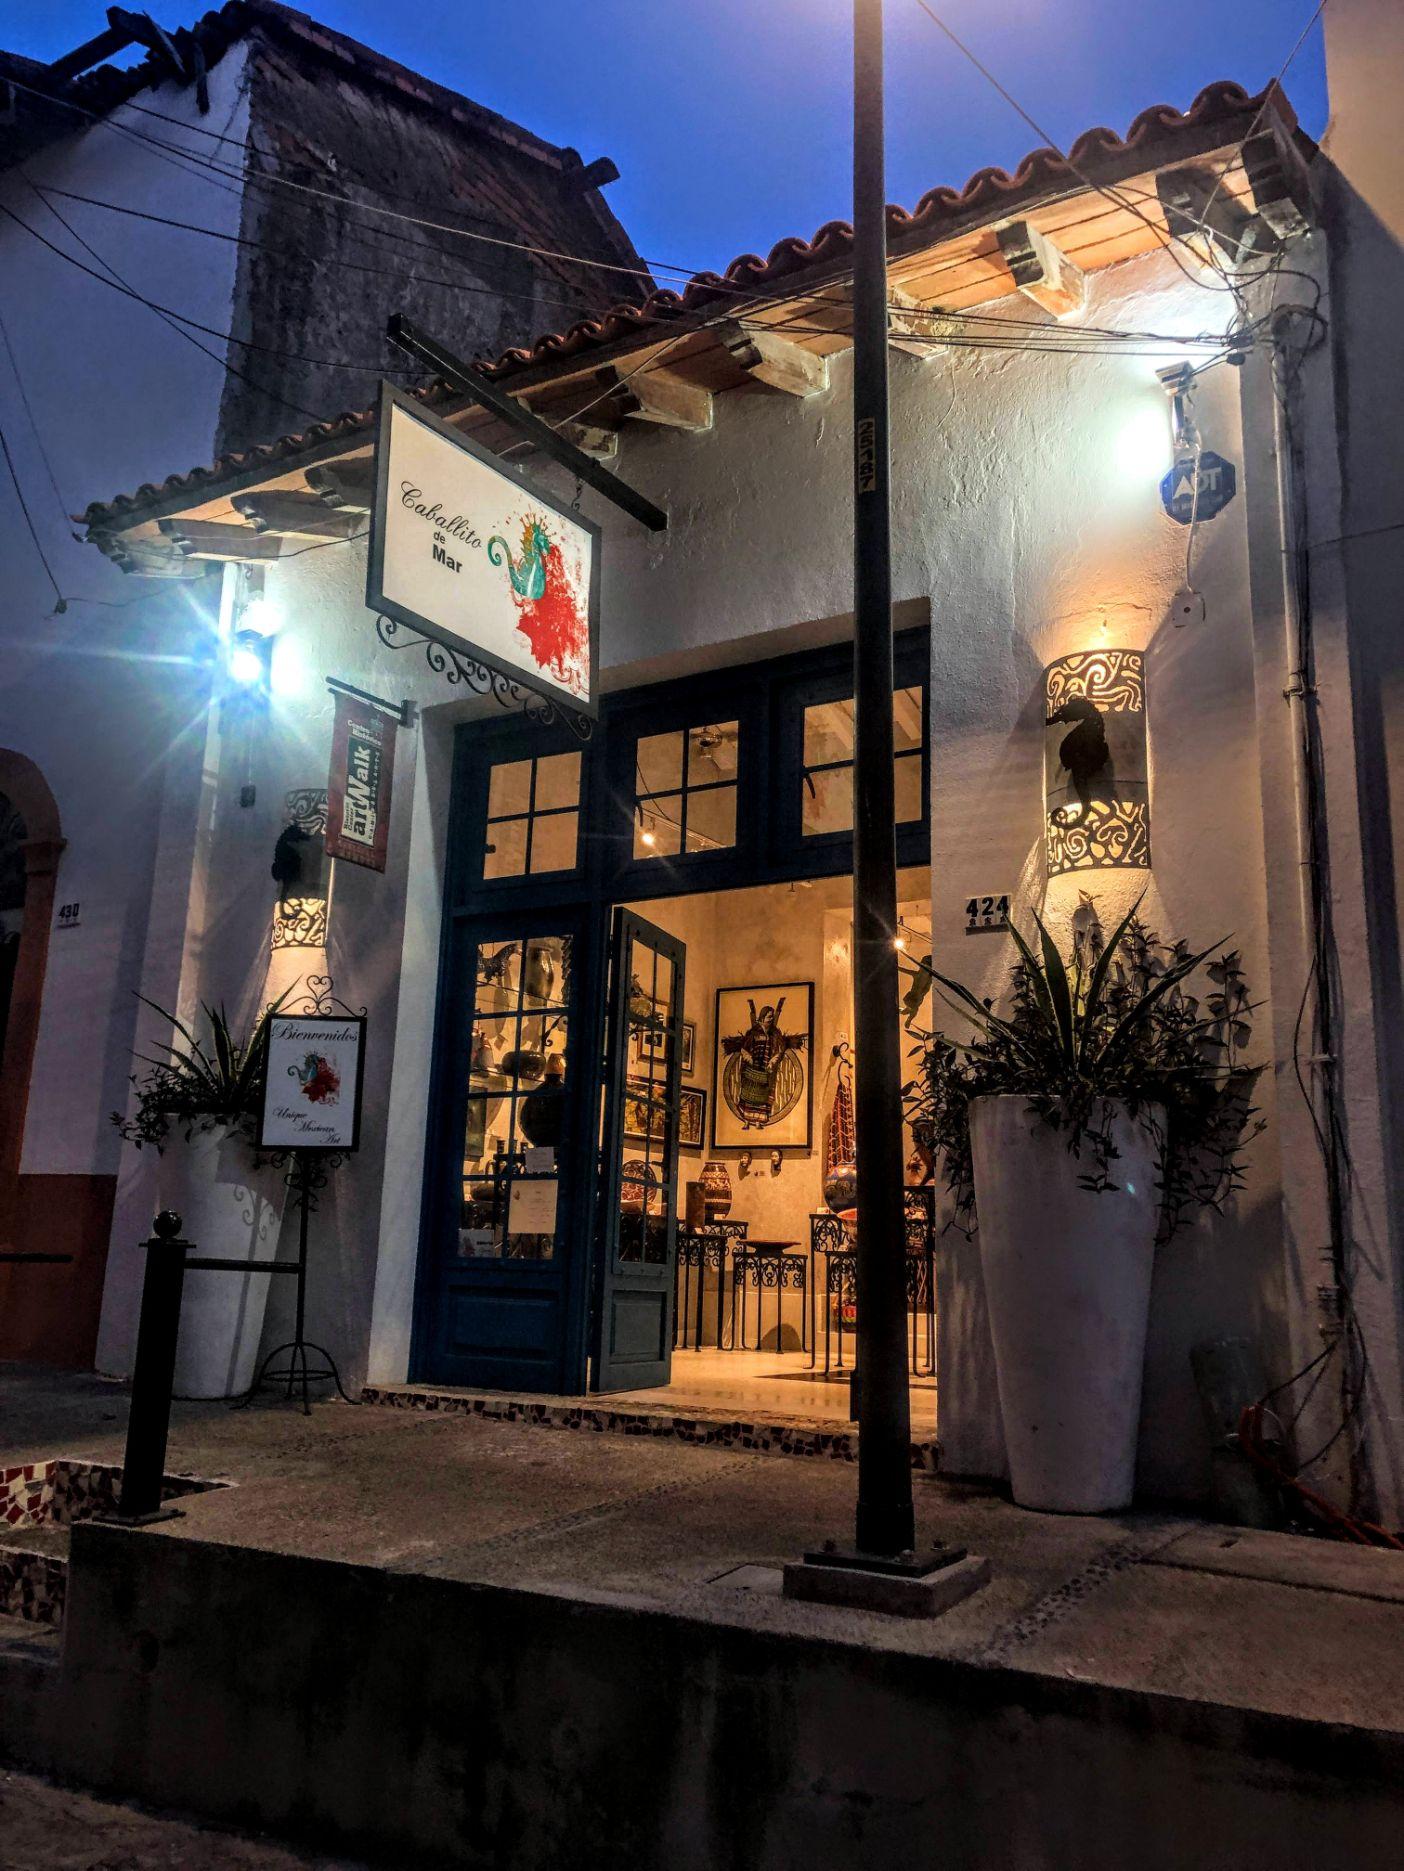 gallery in Puerto Vallarta, lit up for the Wednesday night art walk